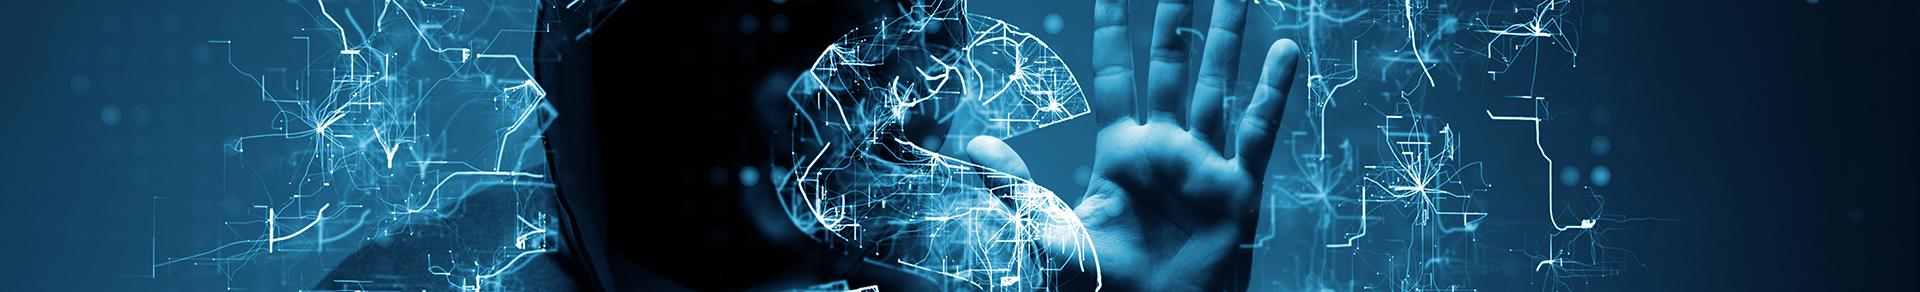 E-book: Cyberbrime op de zaak